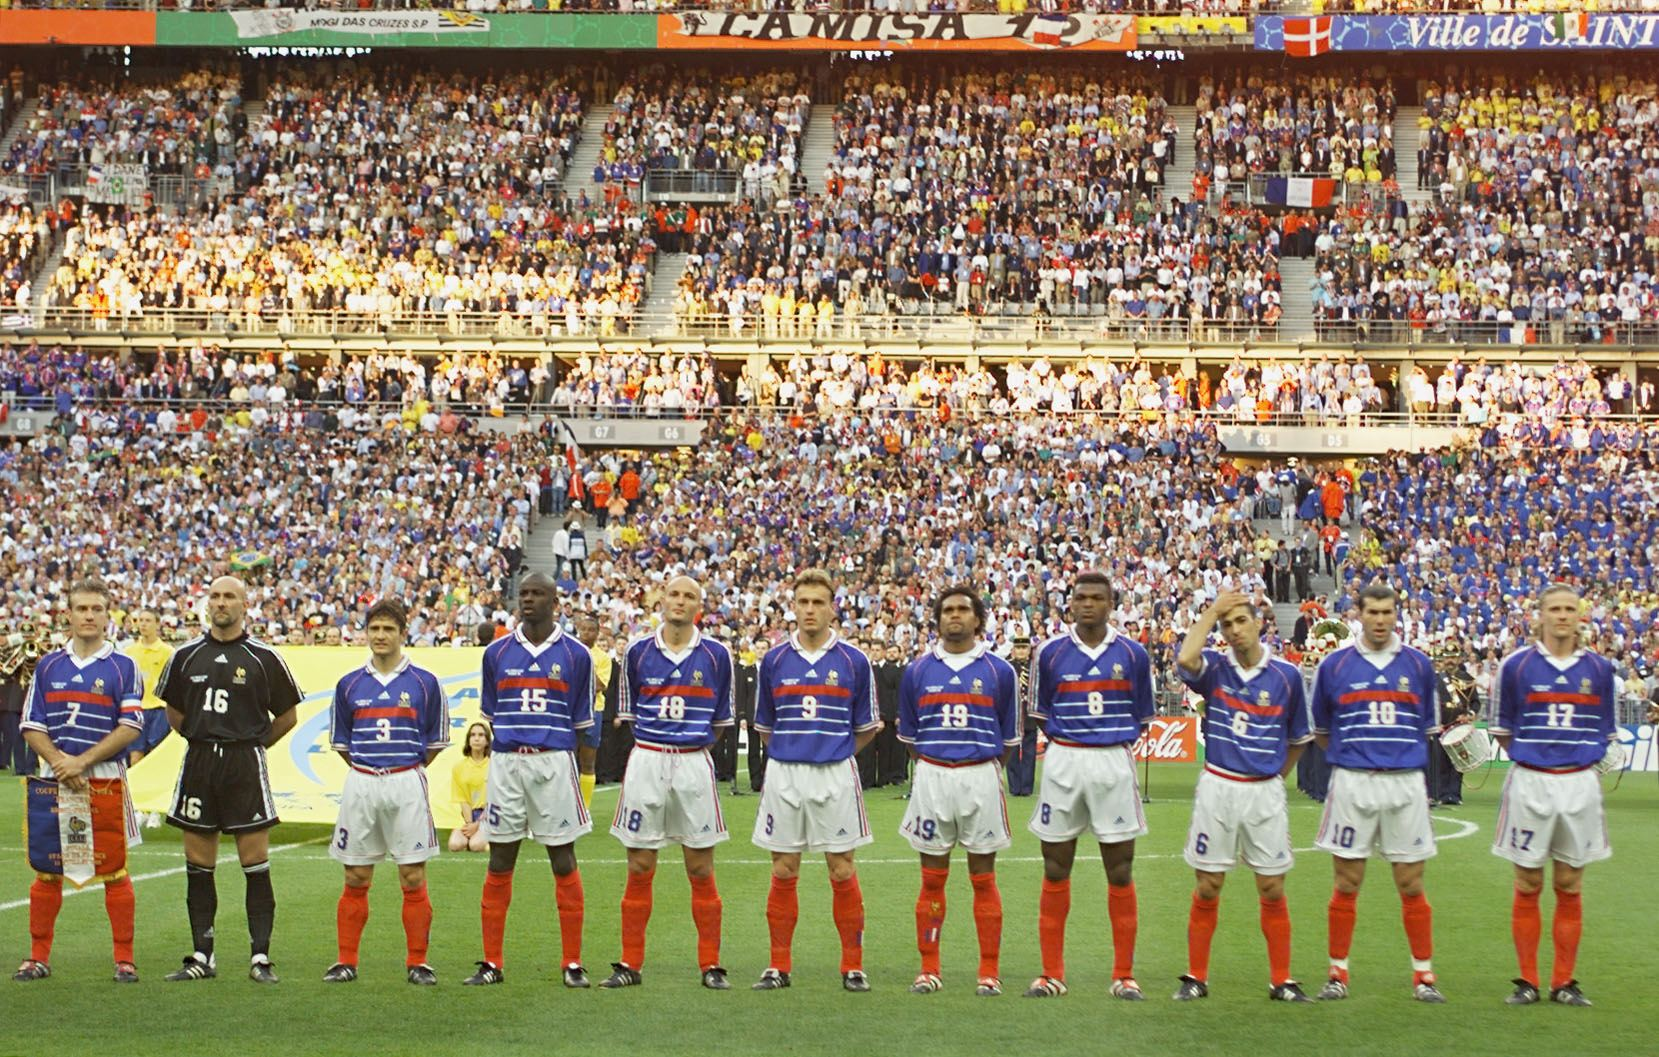 CUP-FR98-BRA-FRA-FRENCH TEAM POSE